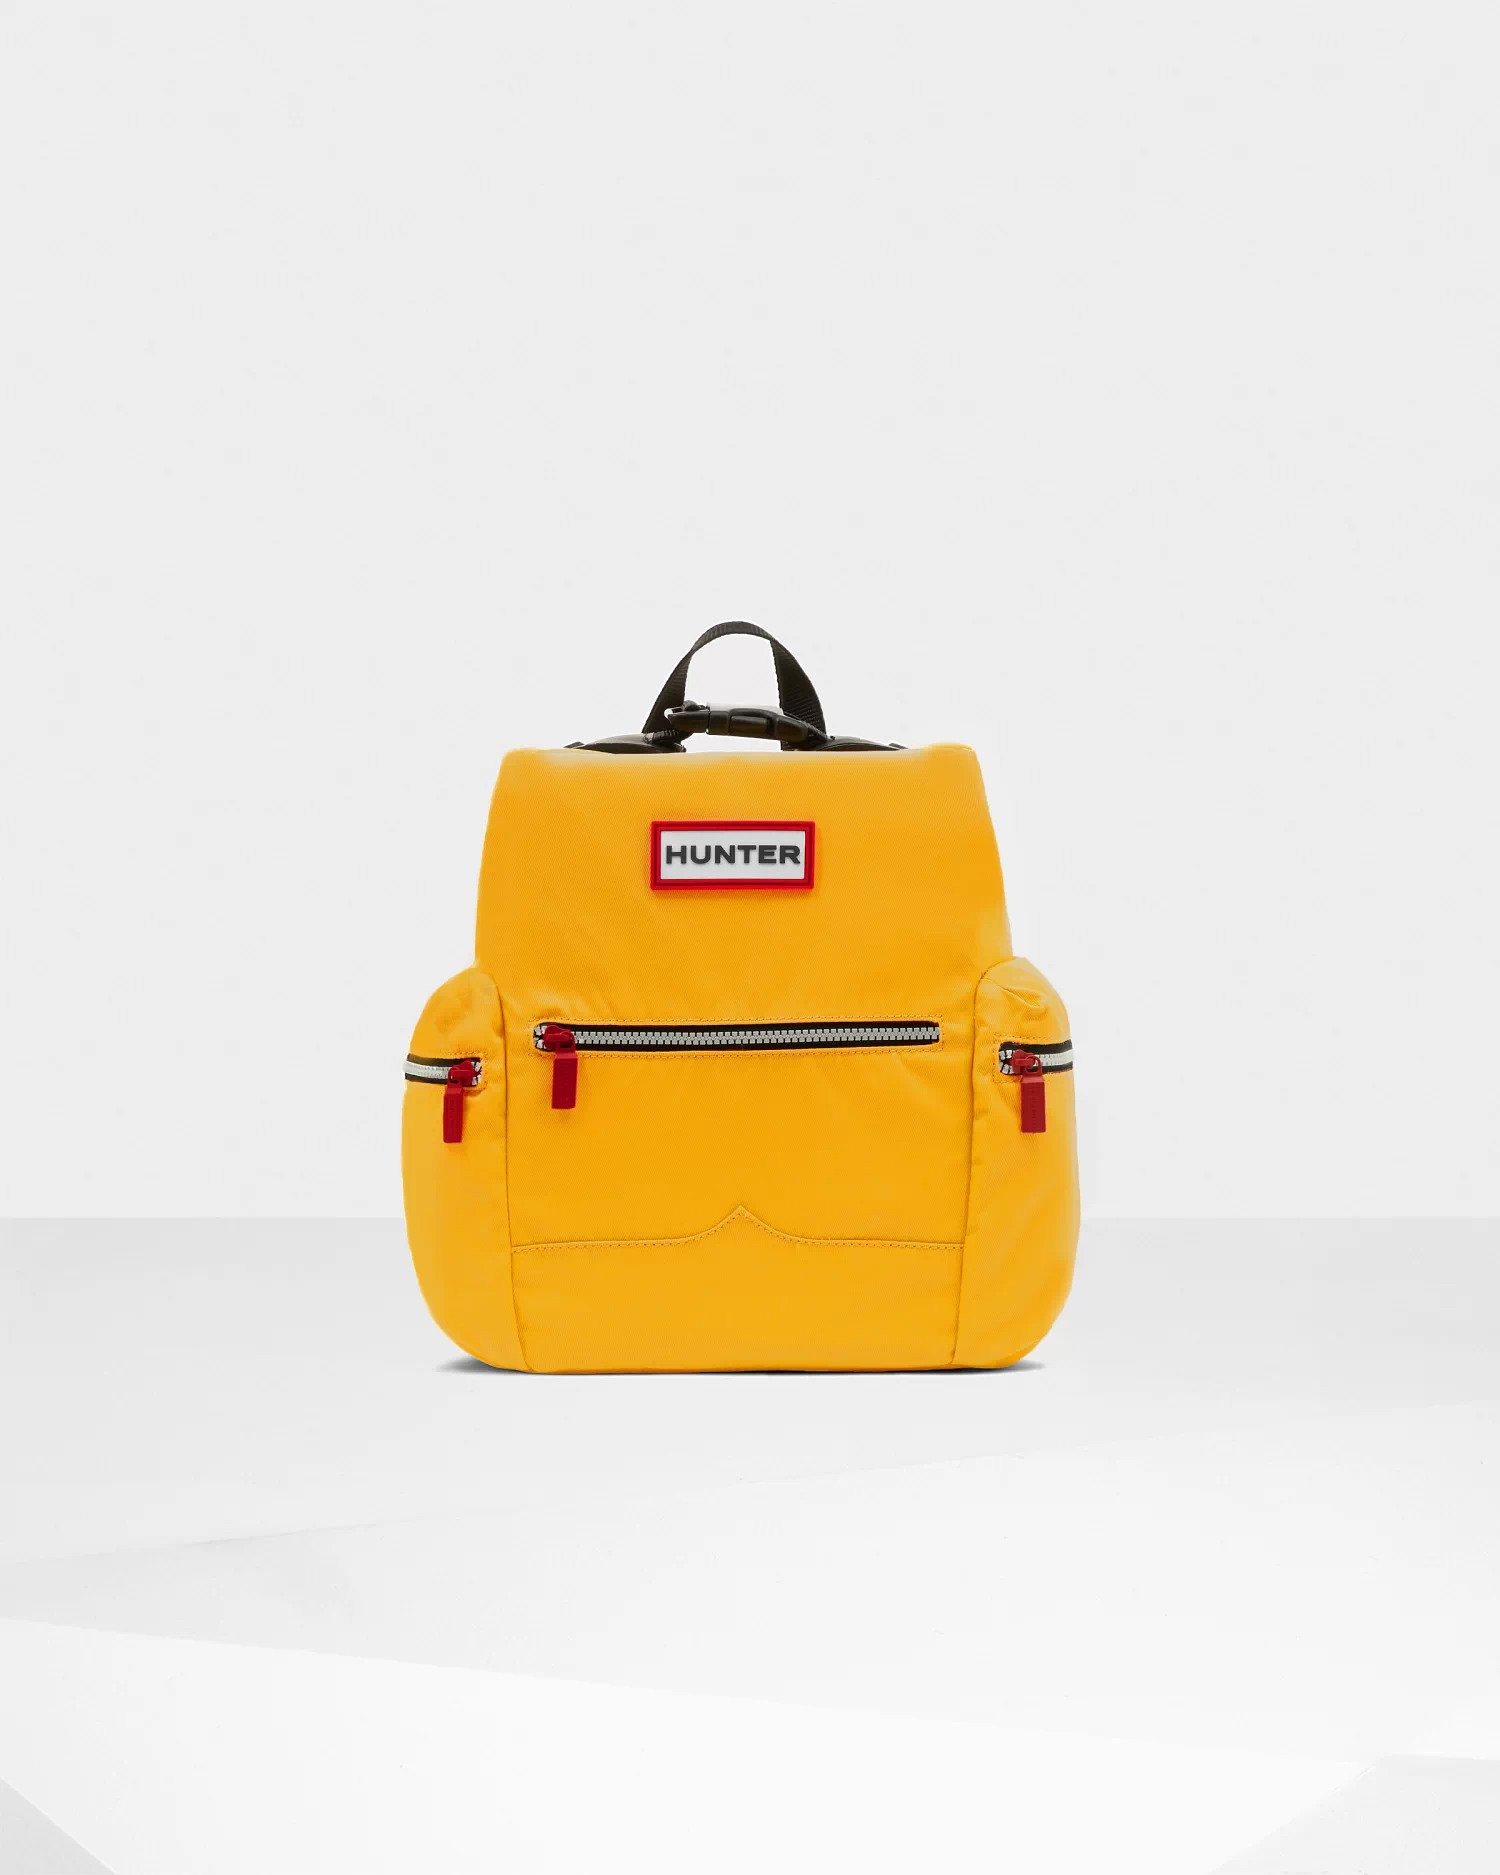 Weatherproof and spacious Hunter mini laptop backpack.